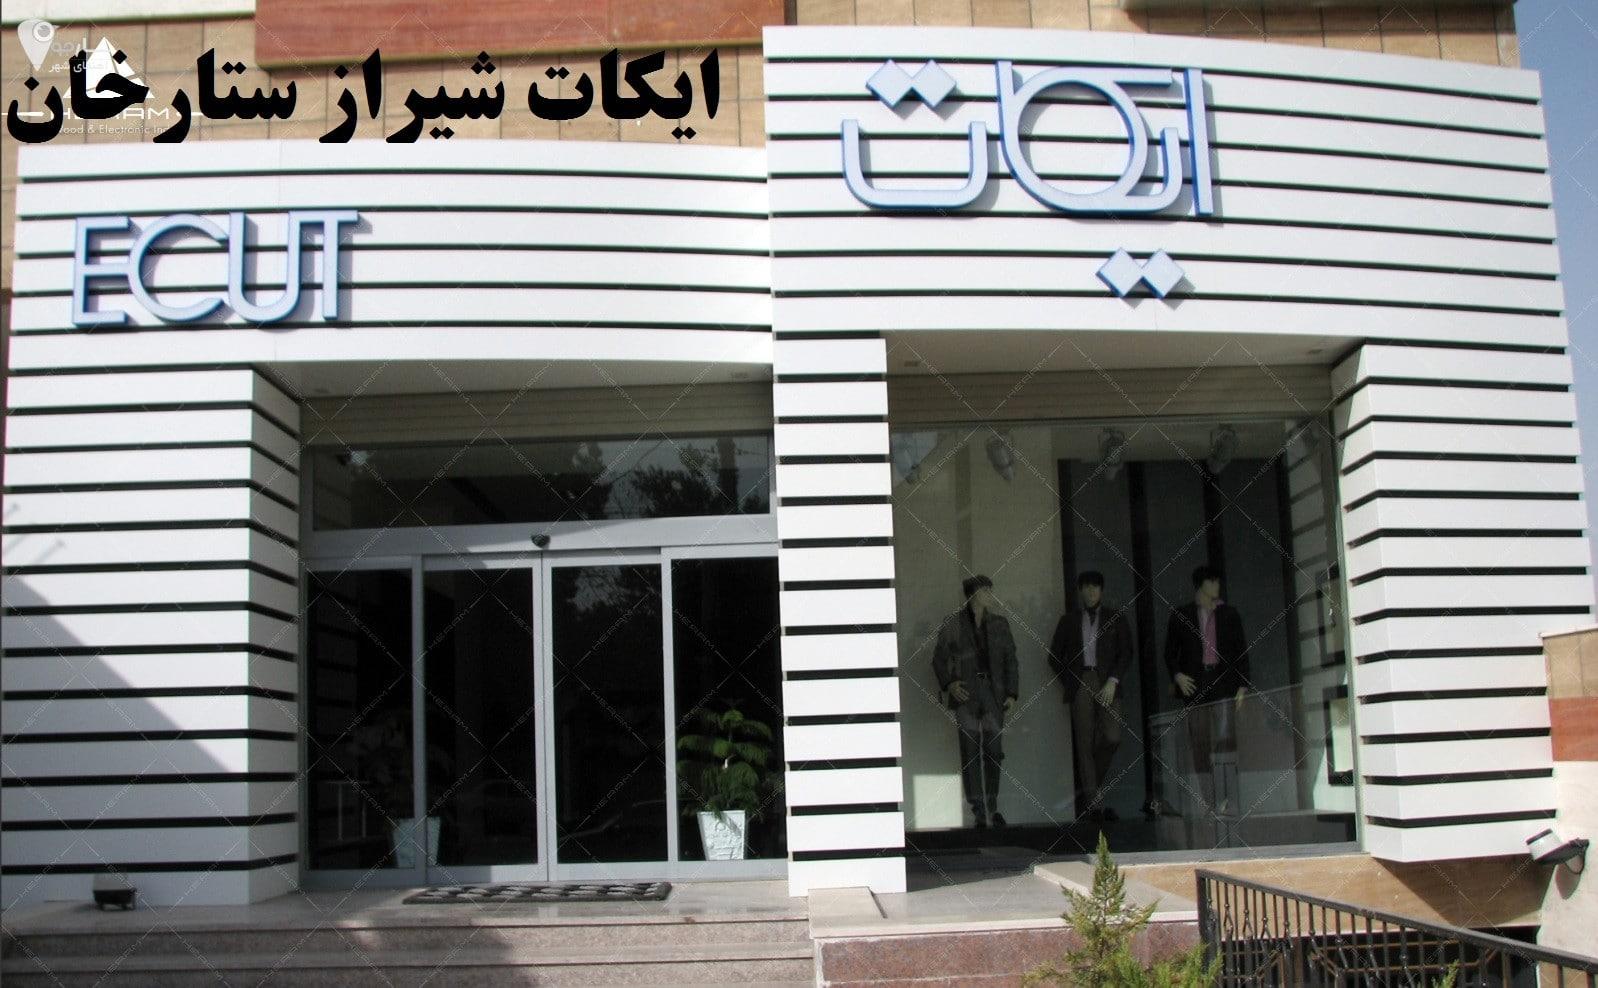 ایکات شیراز ستارخان